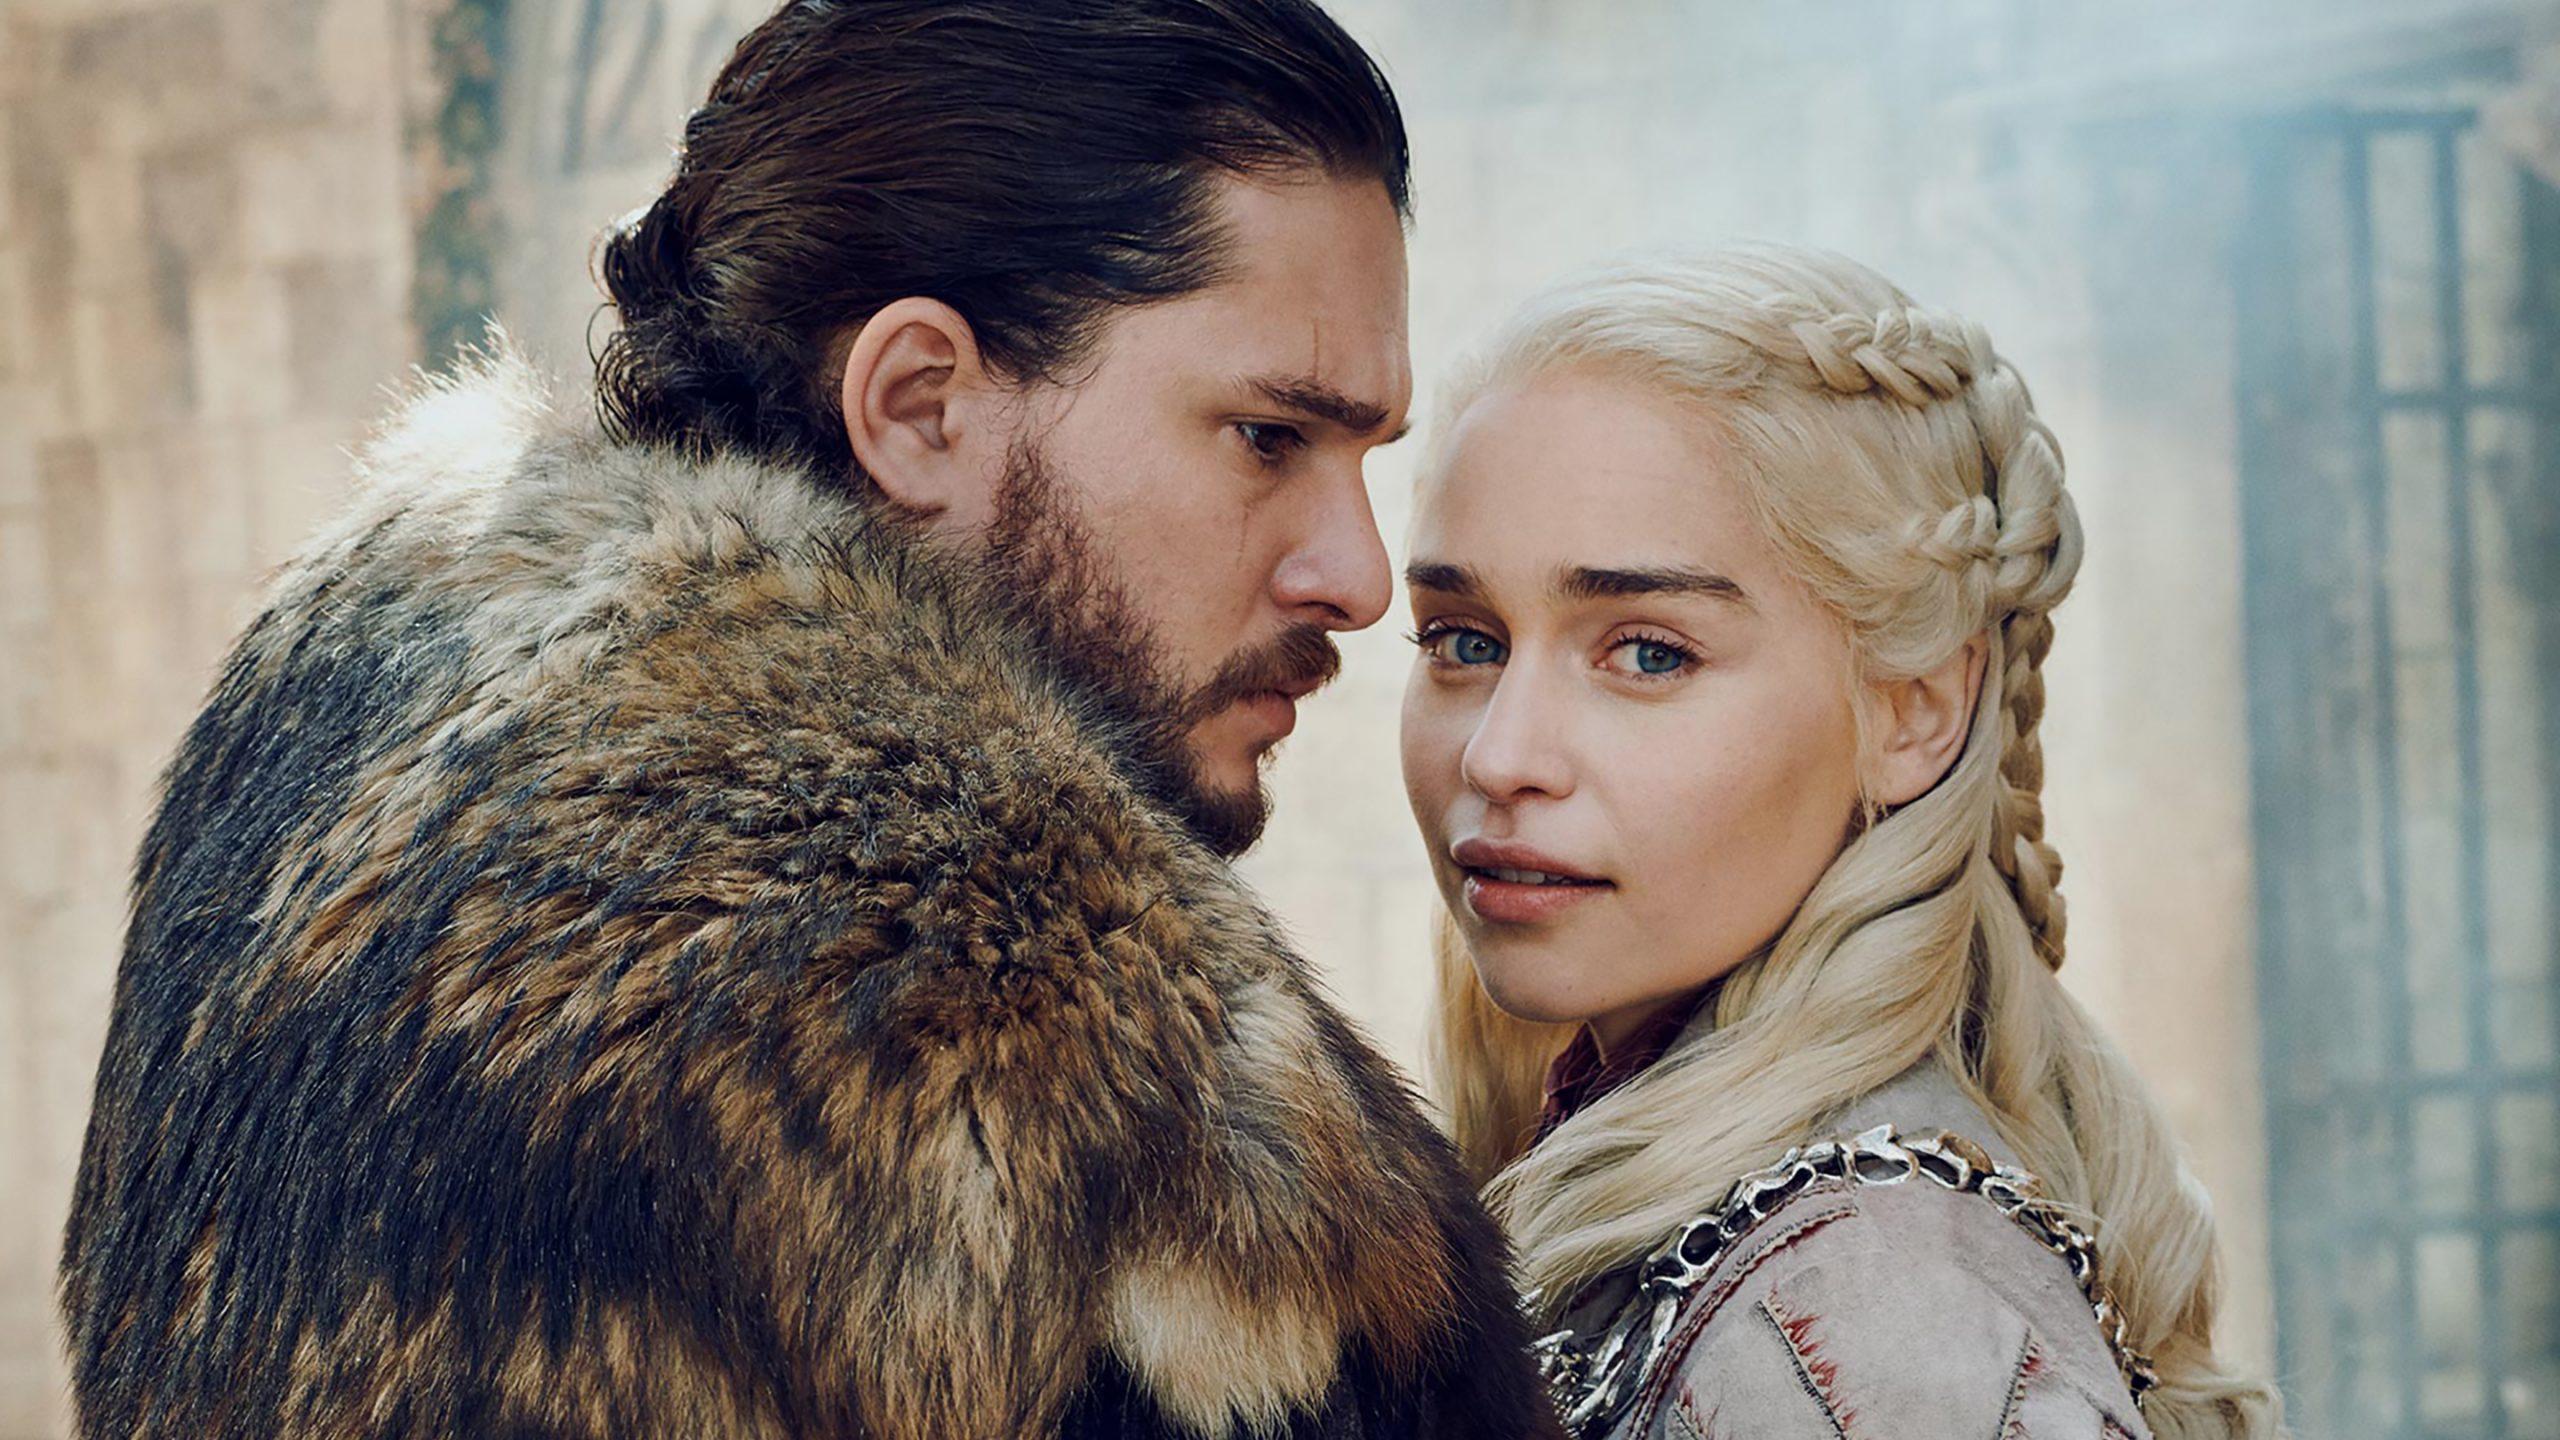 Game Of Thrones Wallpaper Hd 4k Season 8 - HD Wallpaper